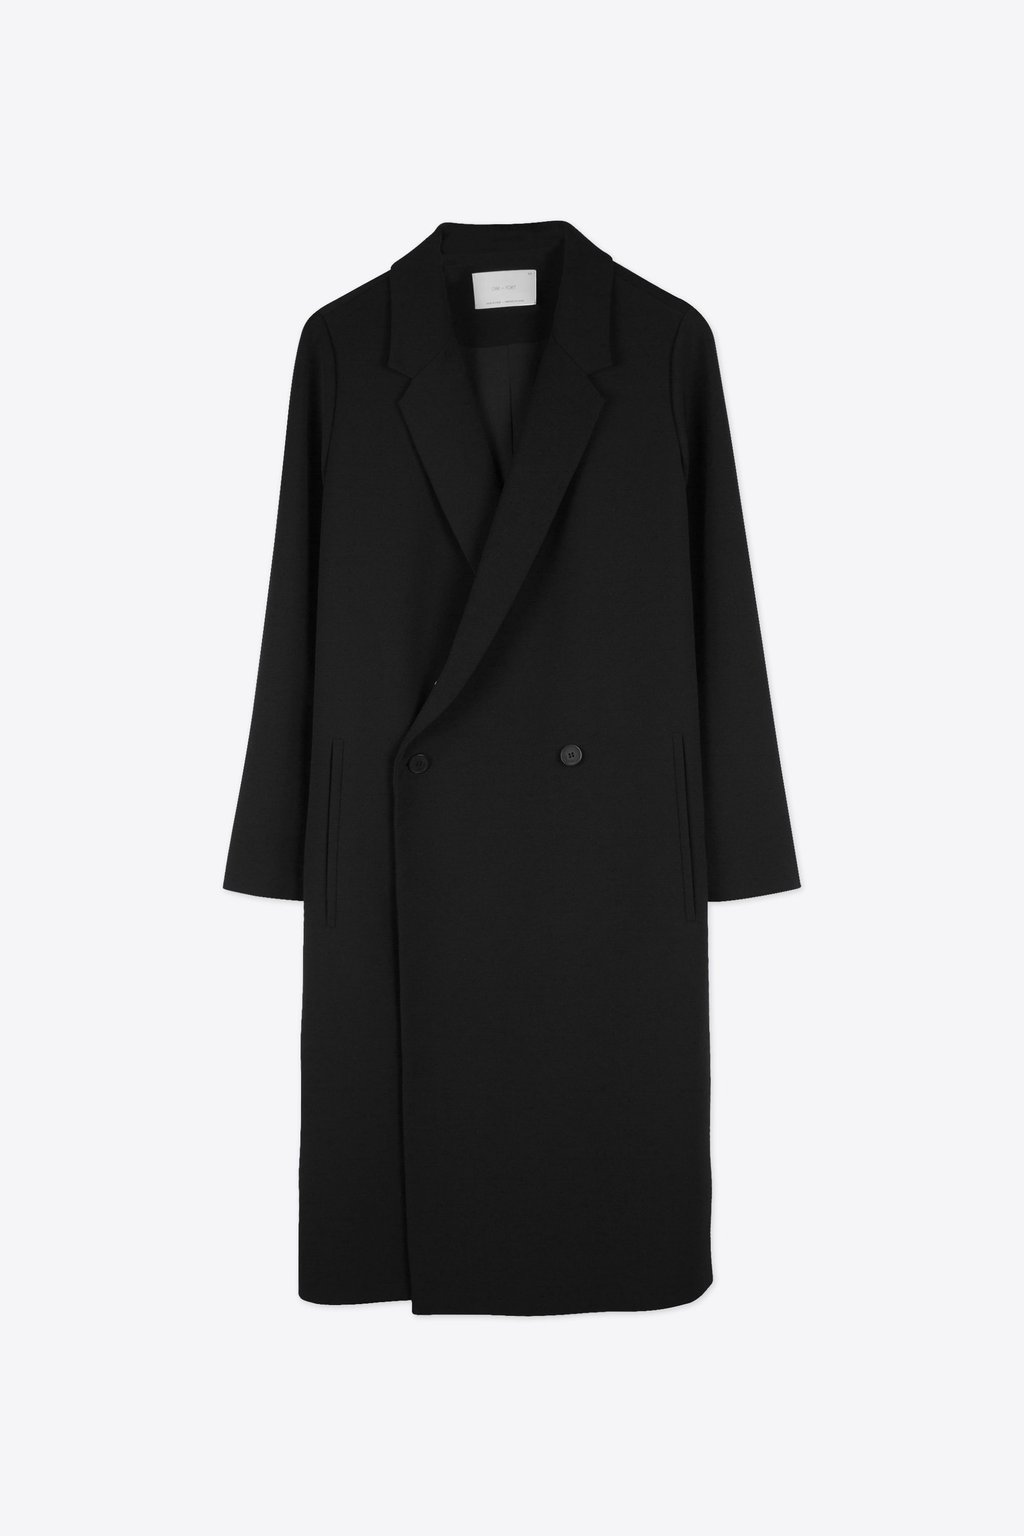 Jacket 1463 Black 7